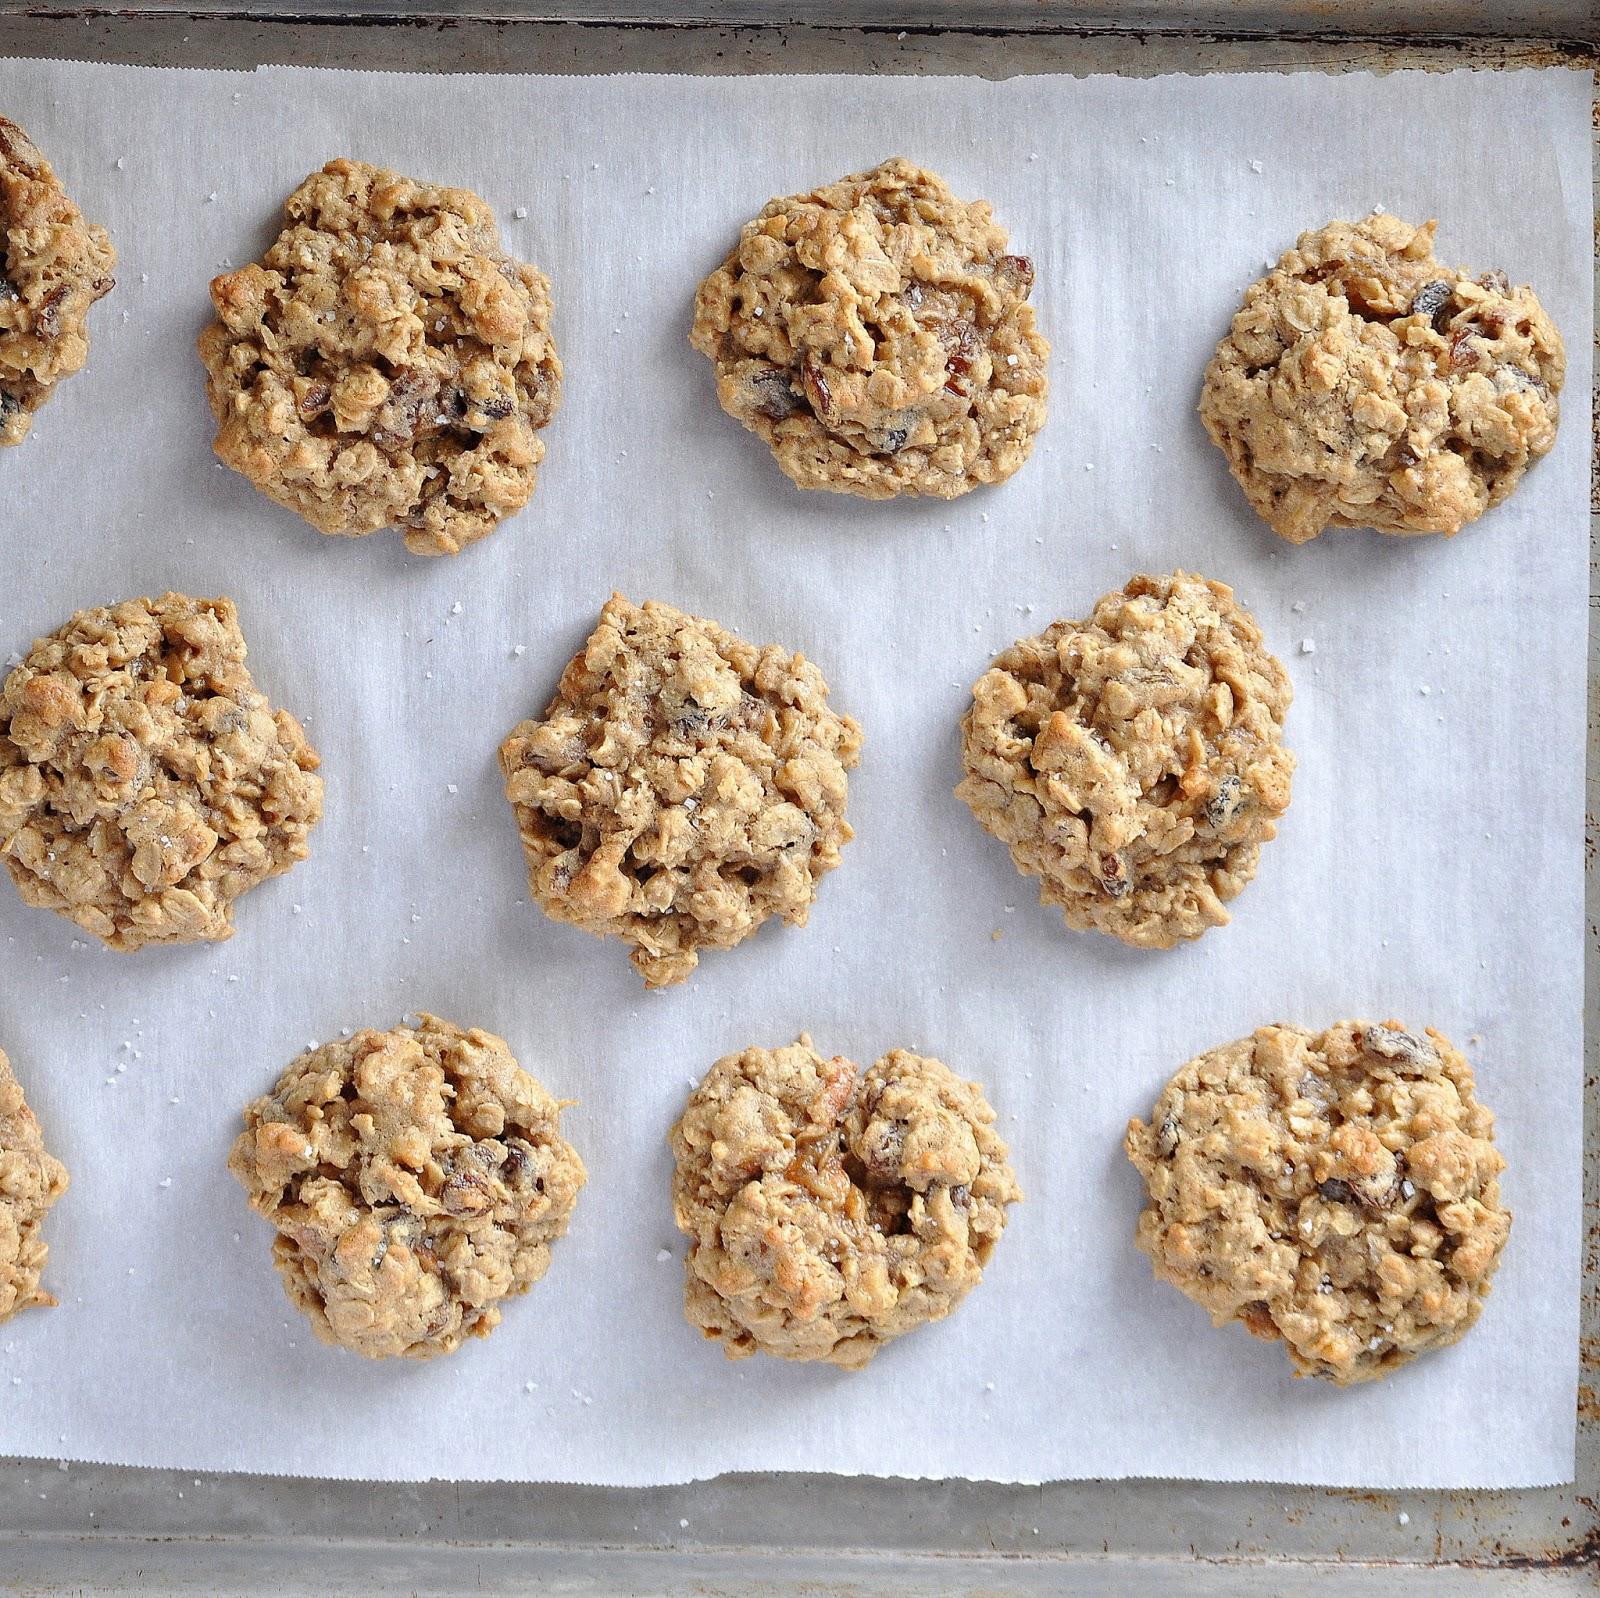 BREANNA'S RECIPE BOX: Toasted Walnut & Raisin Oatmeal Cookies